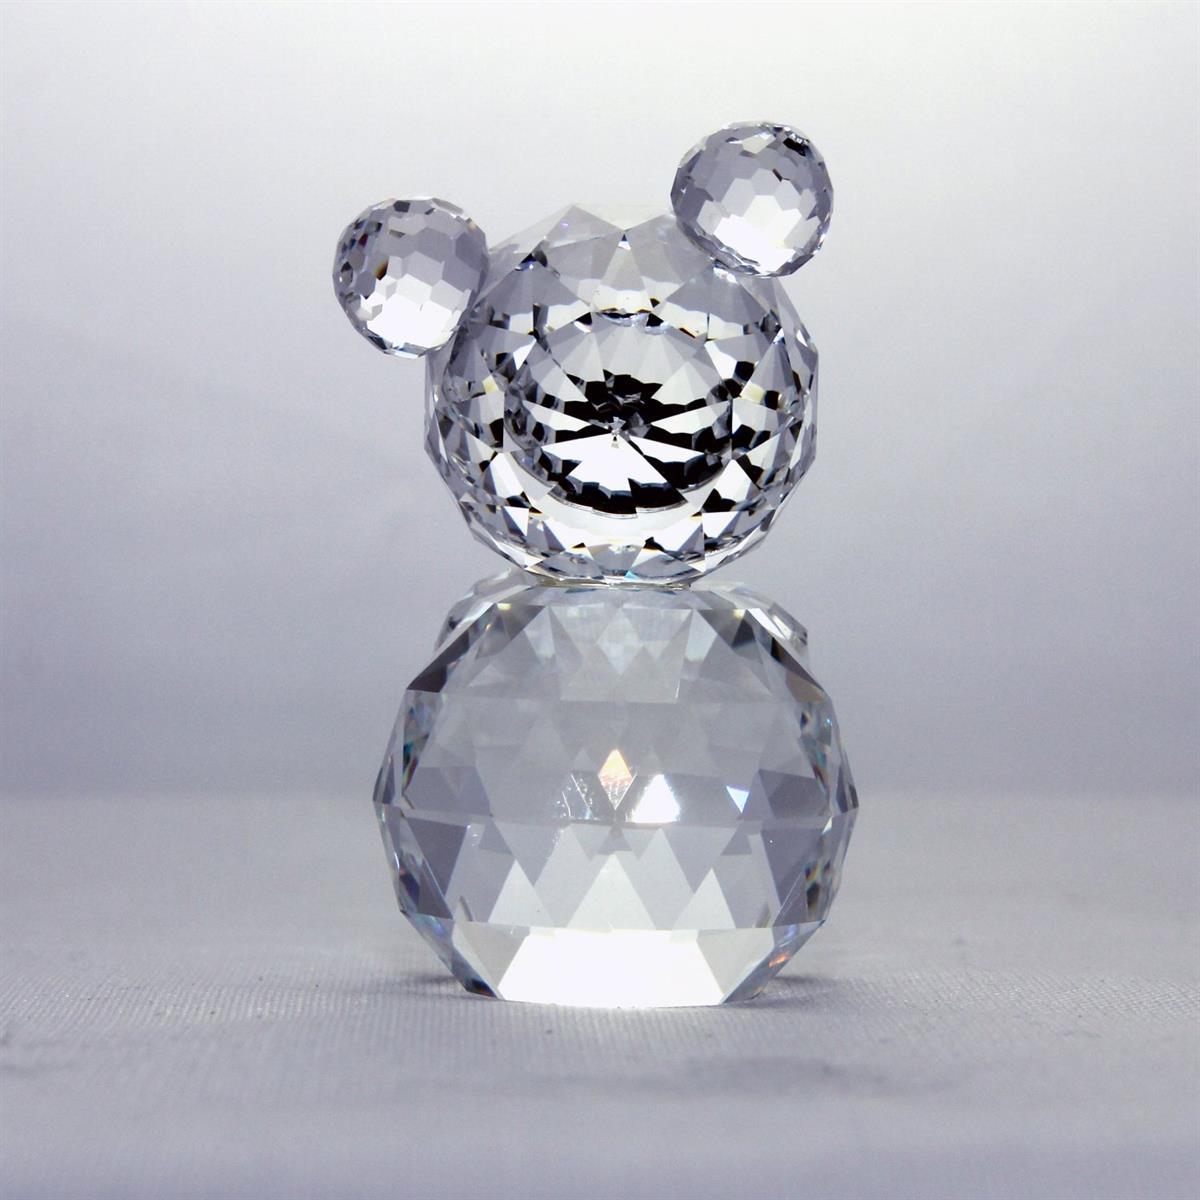 Figuras de cristal figura swarovski 012262 oso mini - Figuras de cristal swarovski ...